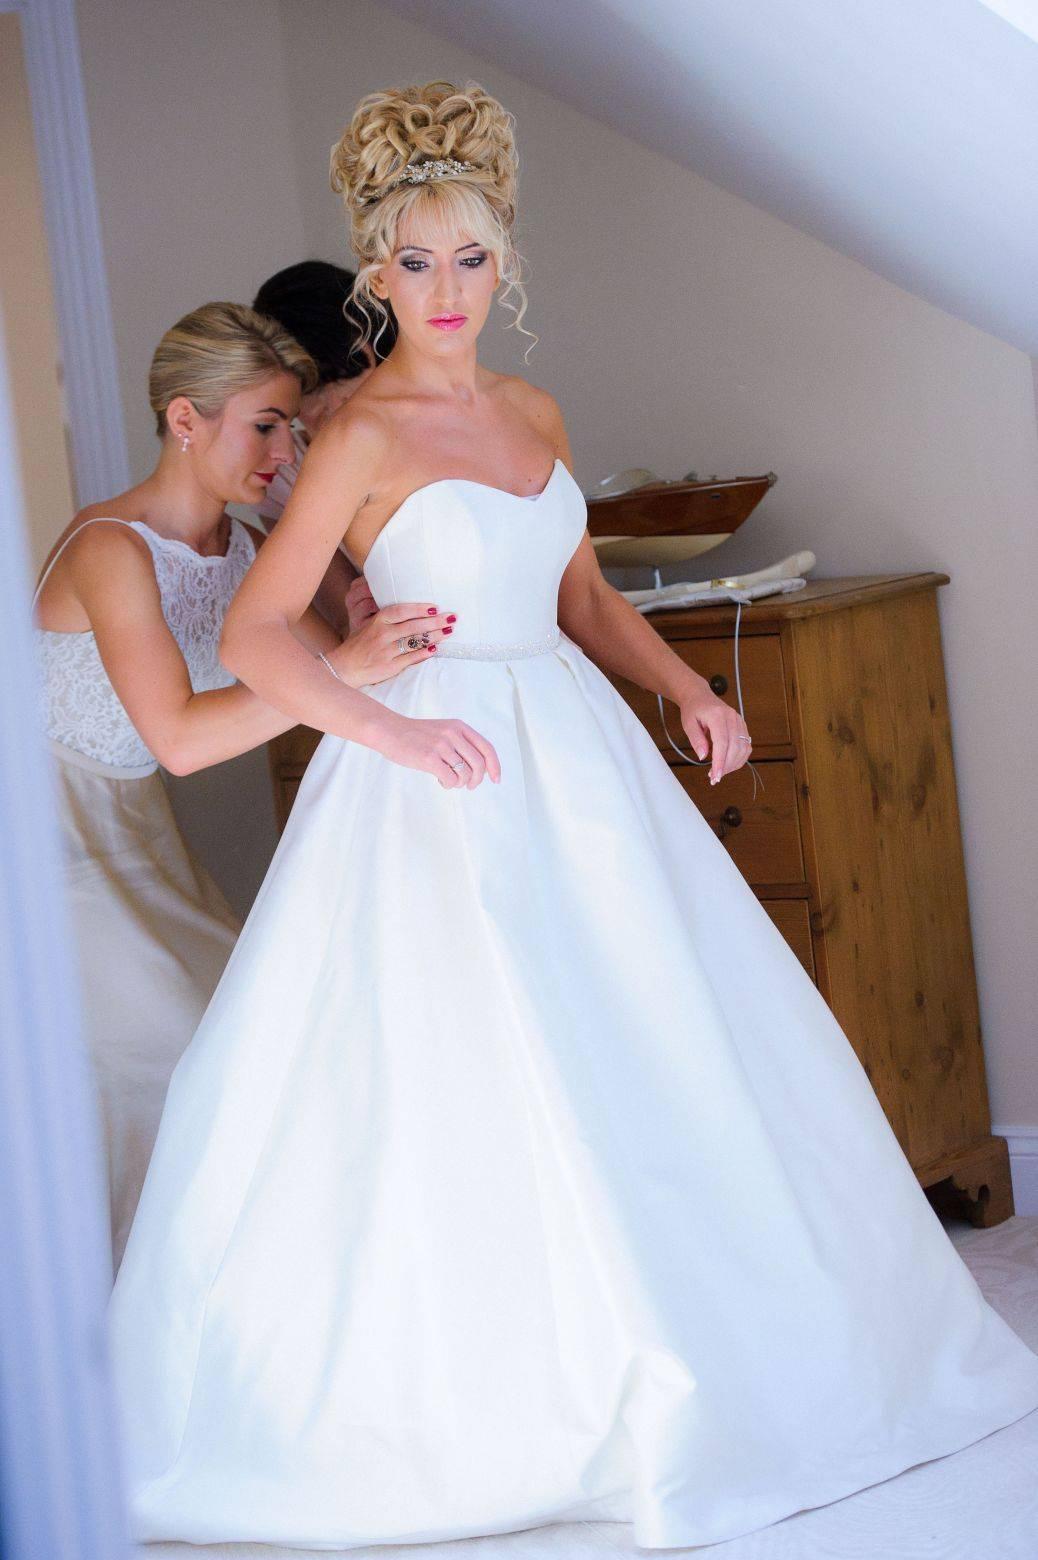 bride getting into dress 1038x1560